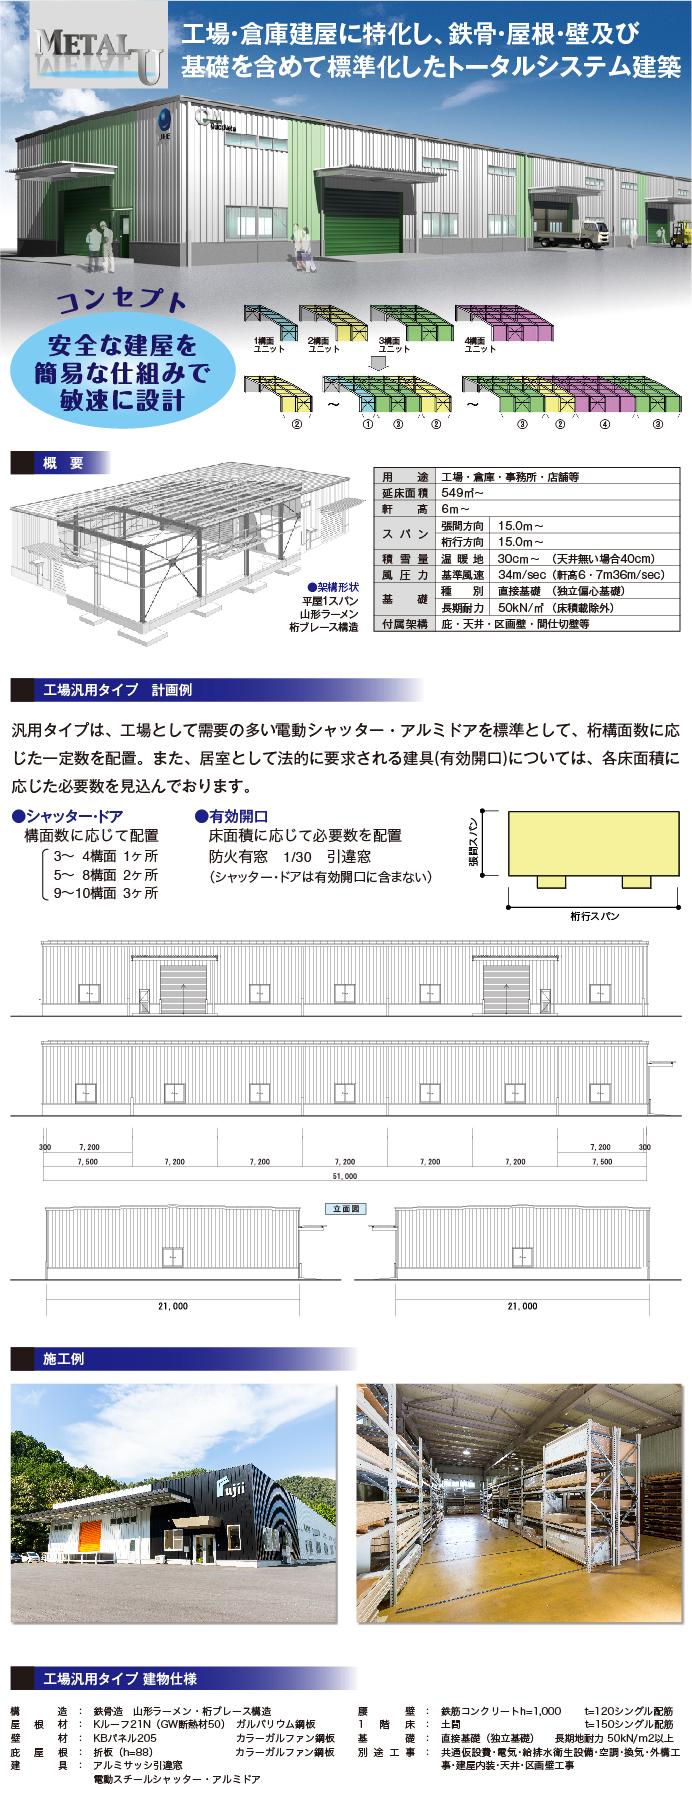 METAL-U工場・倉庫建屋に特化し、鉄骨・屋根・壁及び 基礎を含めて標準化したトータルシステム建築